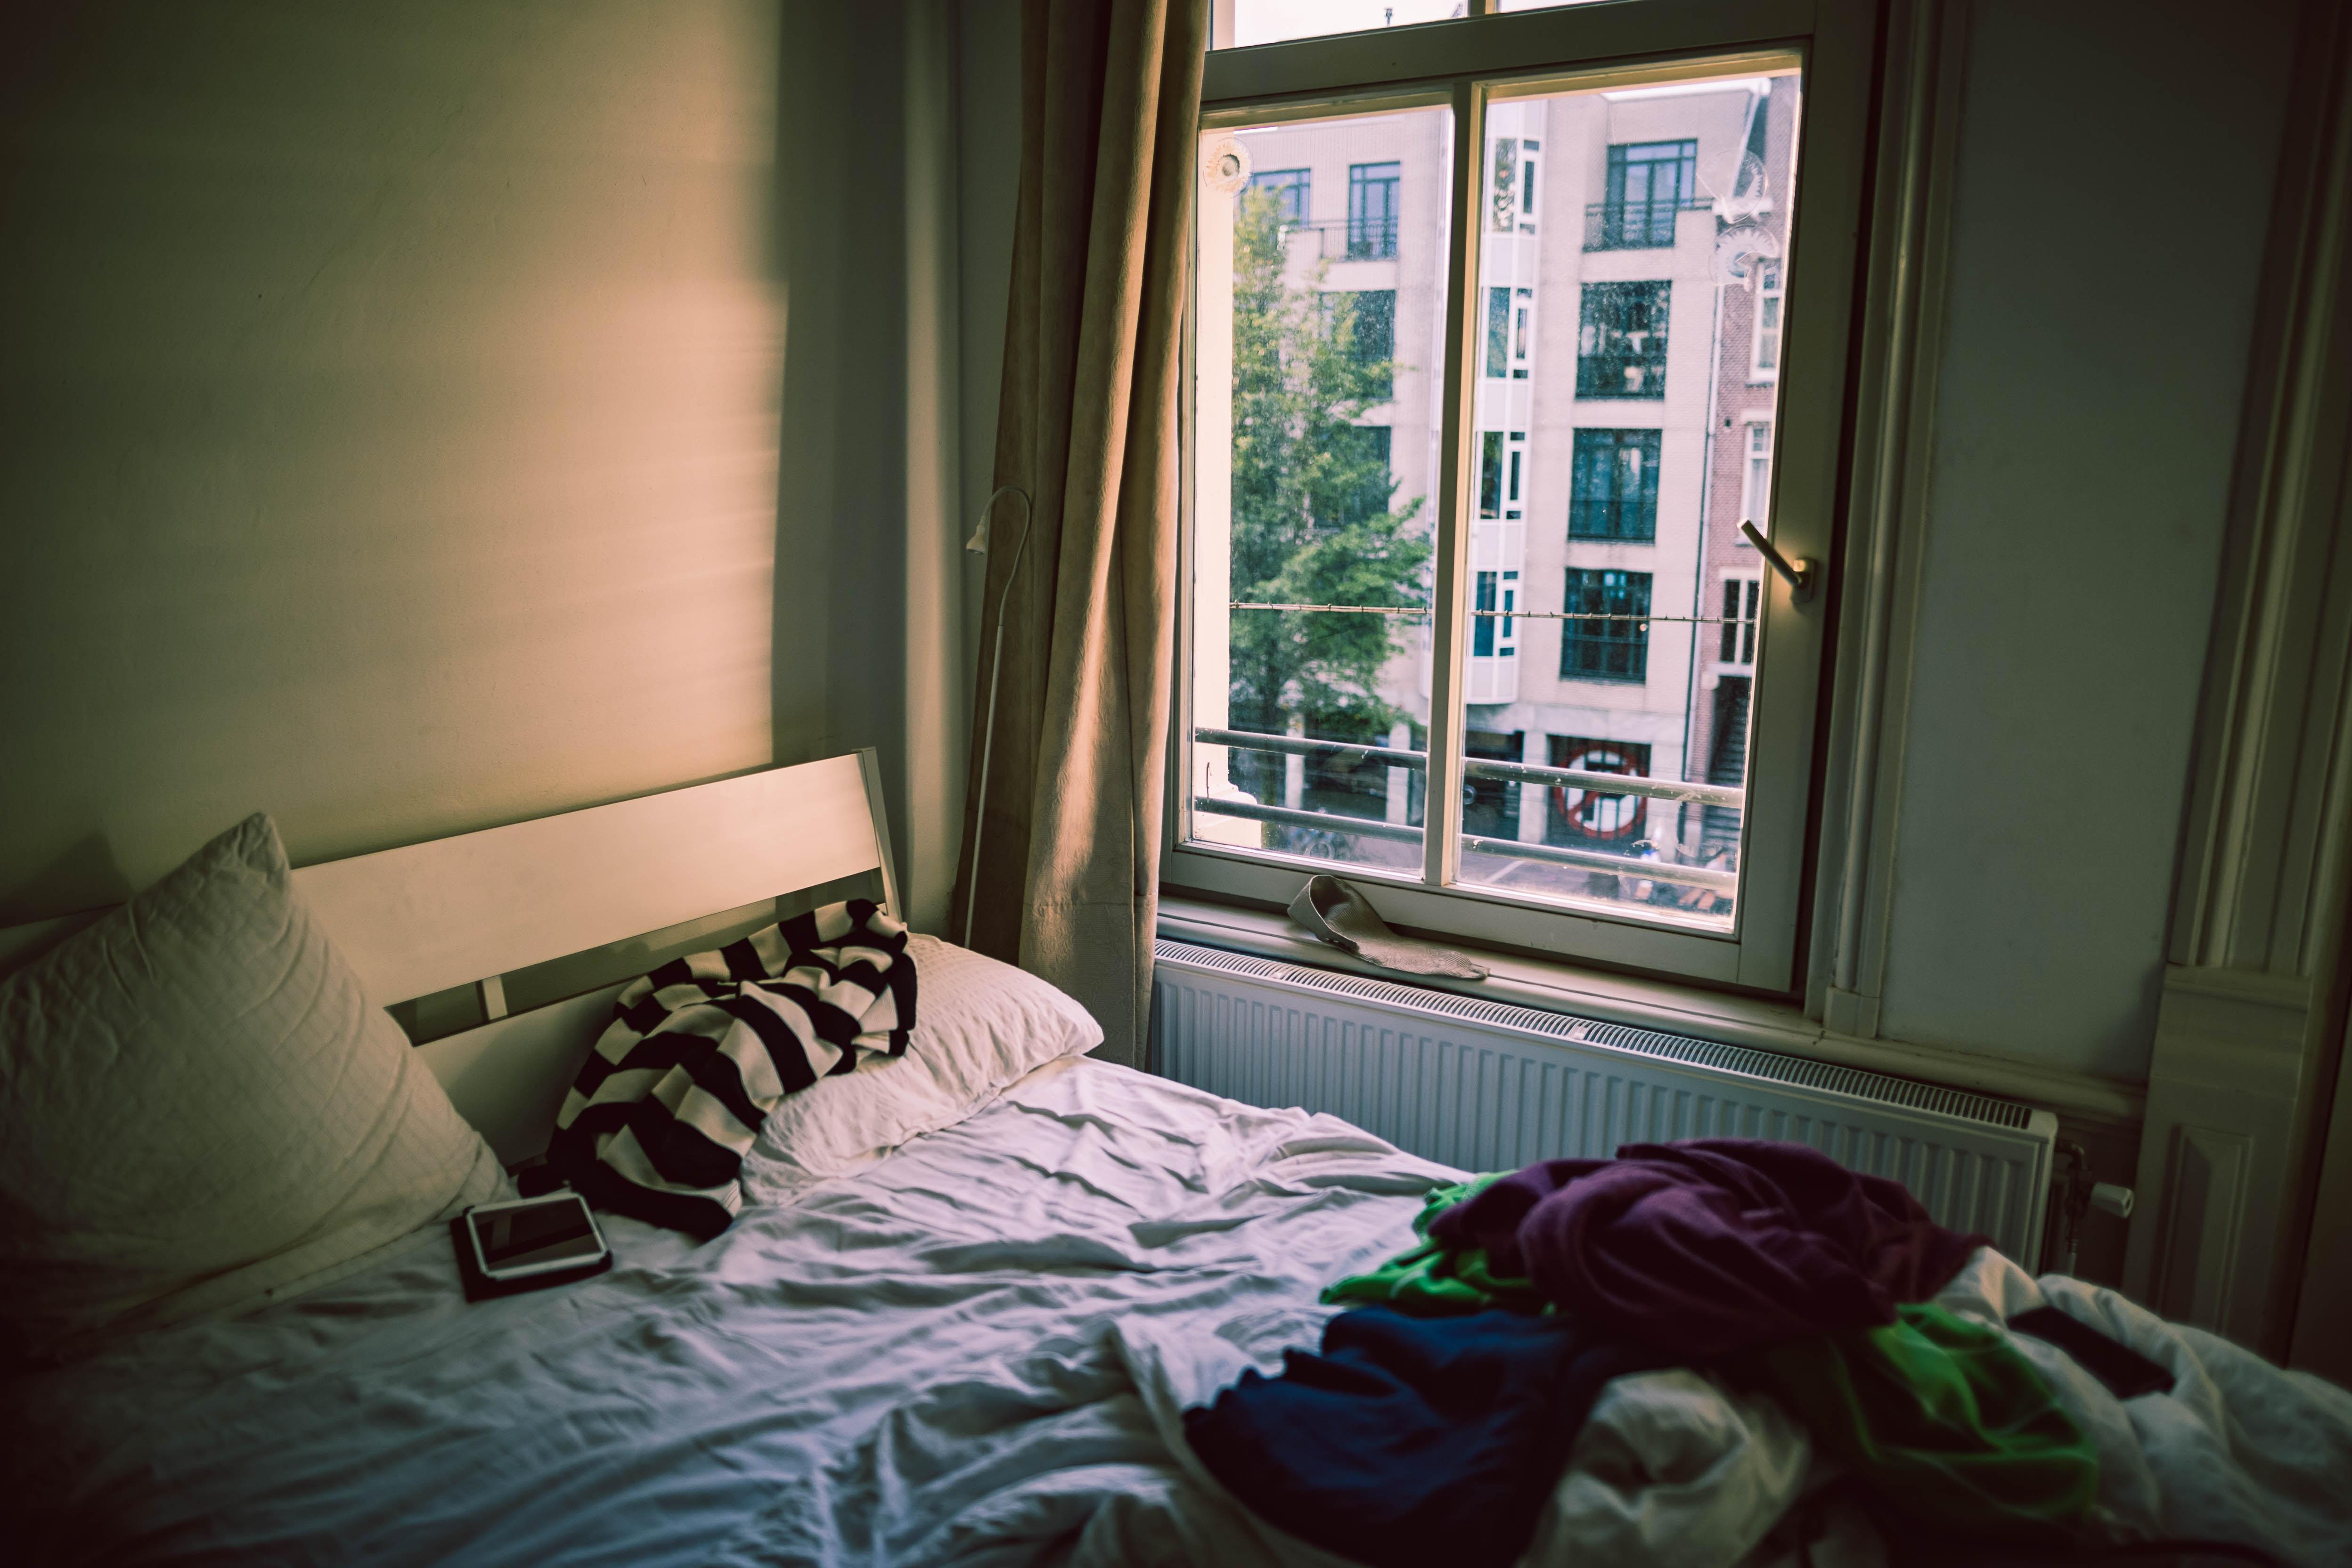 white bedspread